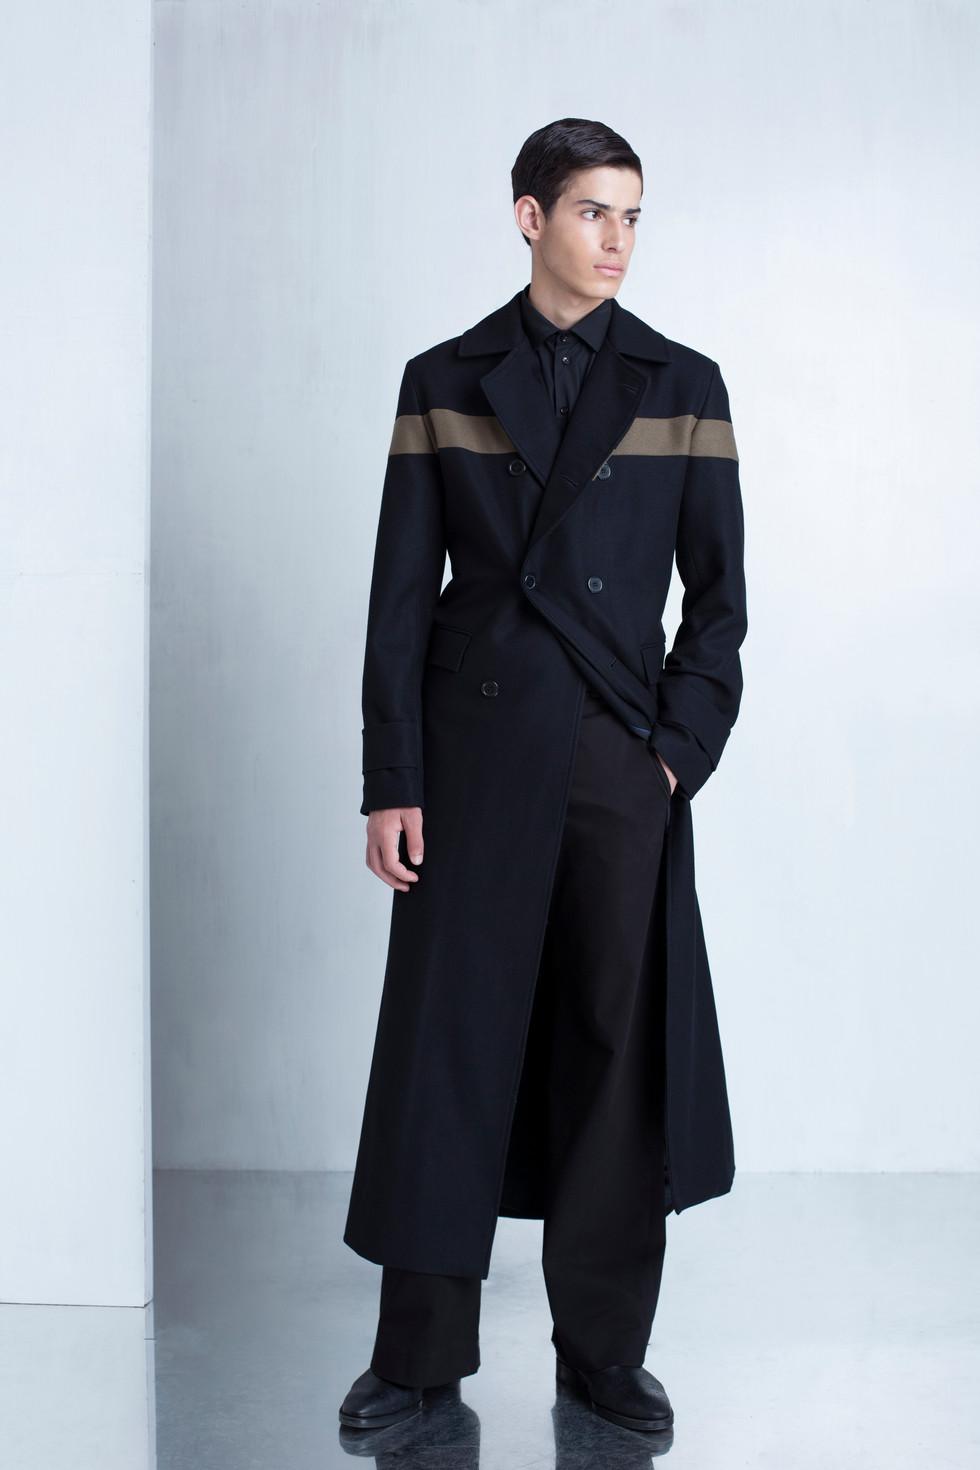 Ariel_Bassan_Minimal_Menswear_AW_LookBook_Tailored_Wool_Coat